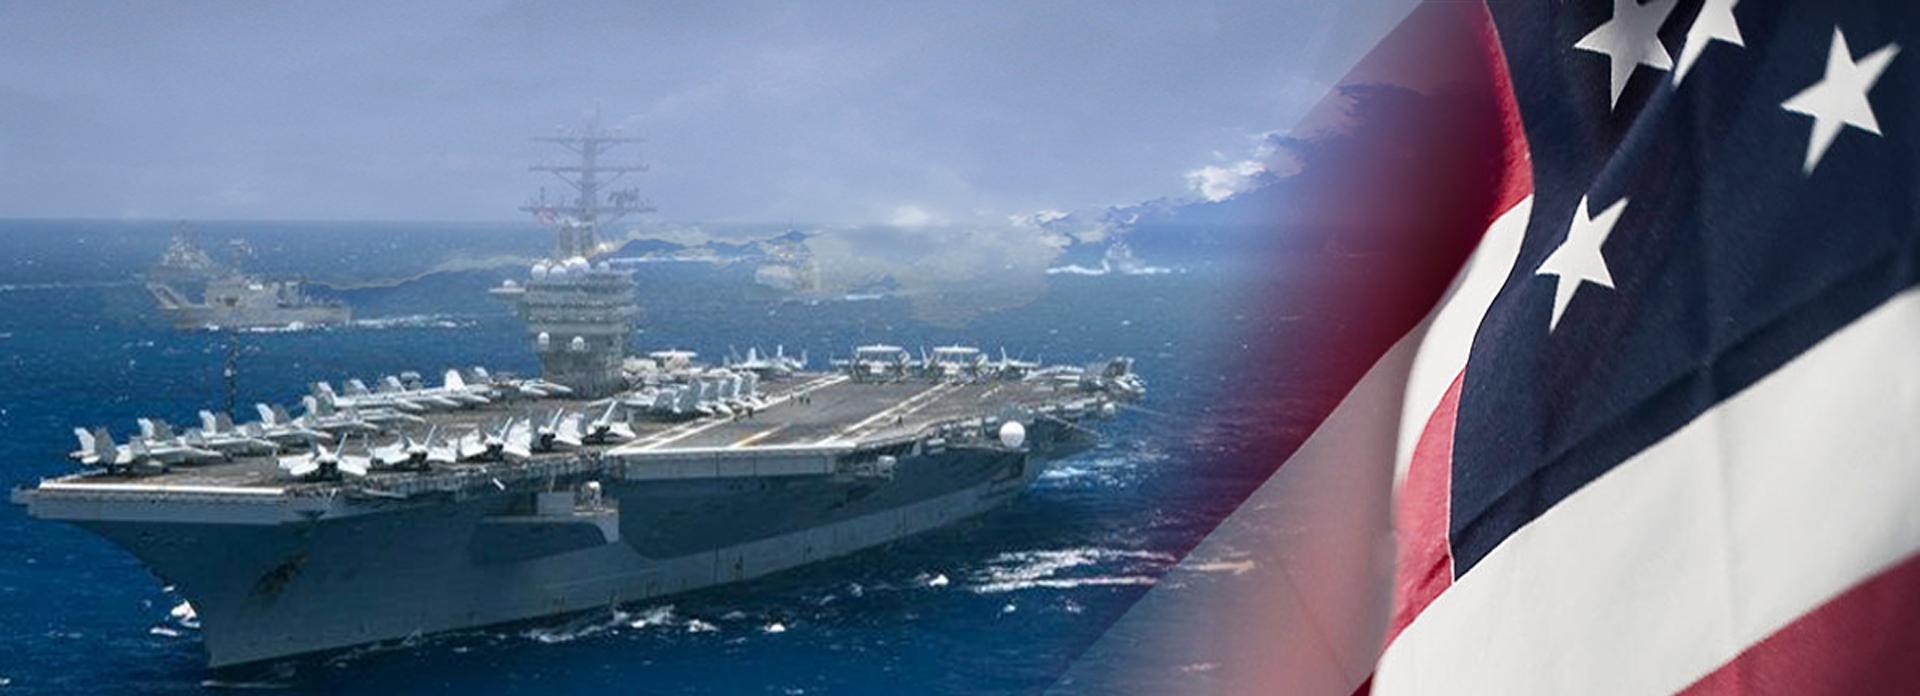 Navy @The American Veteran